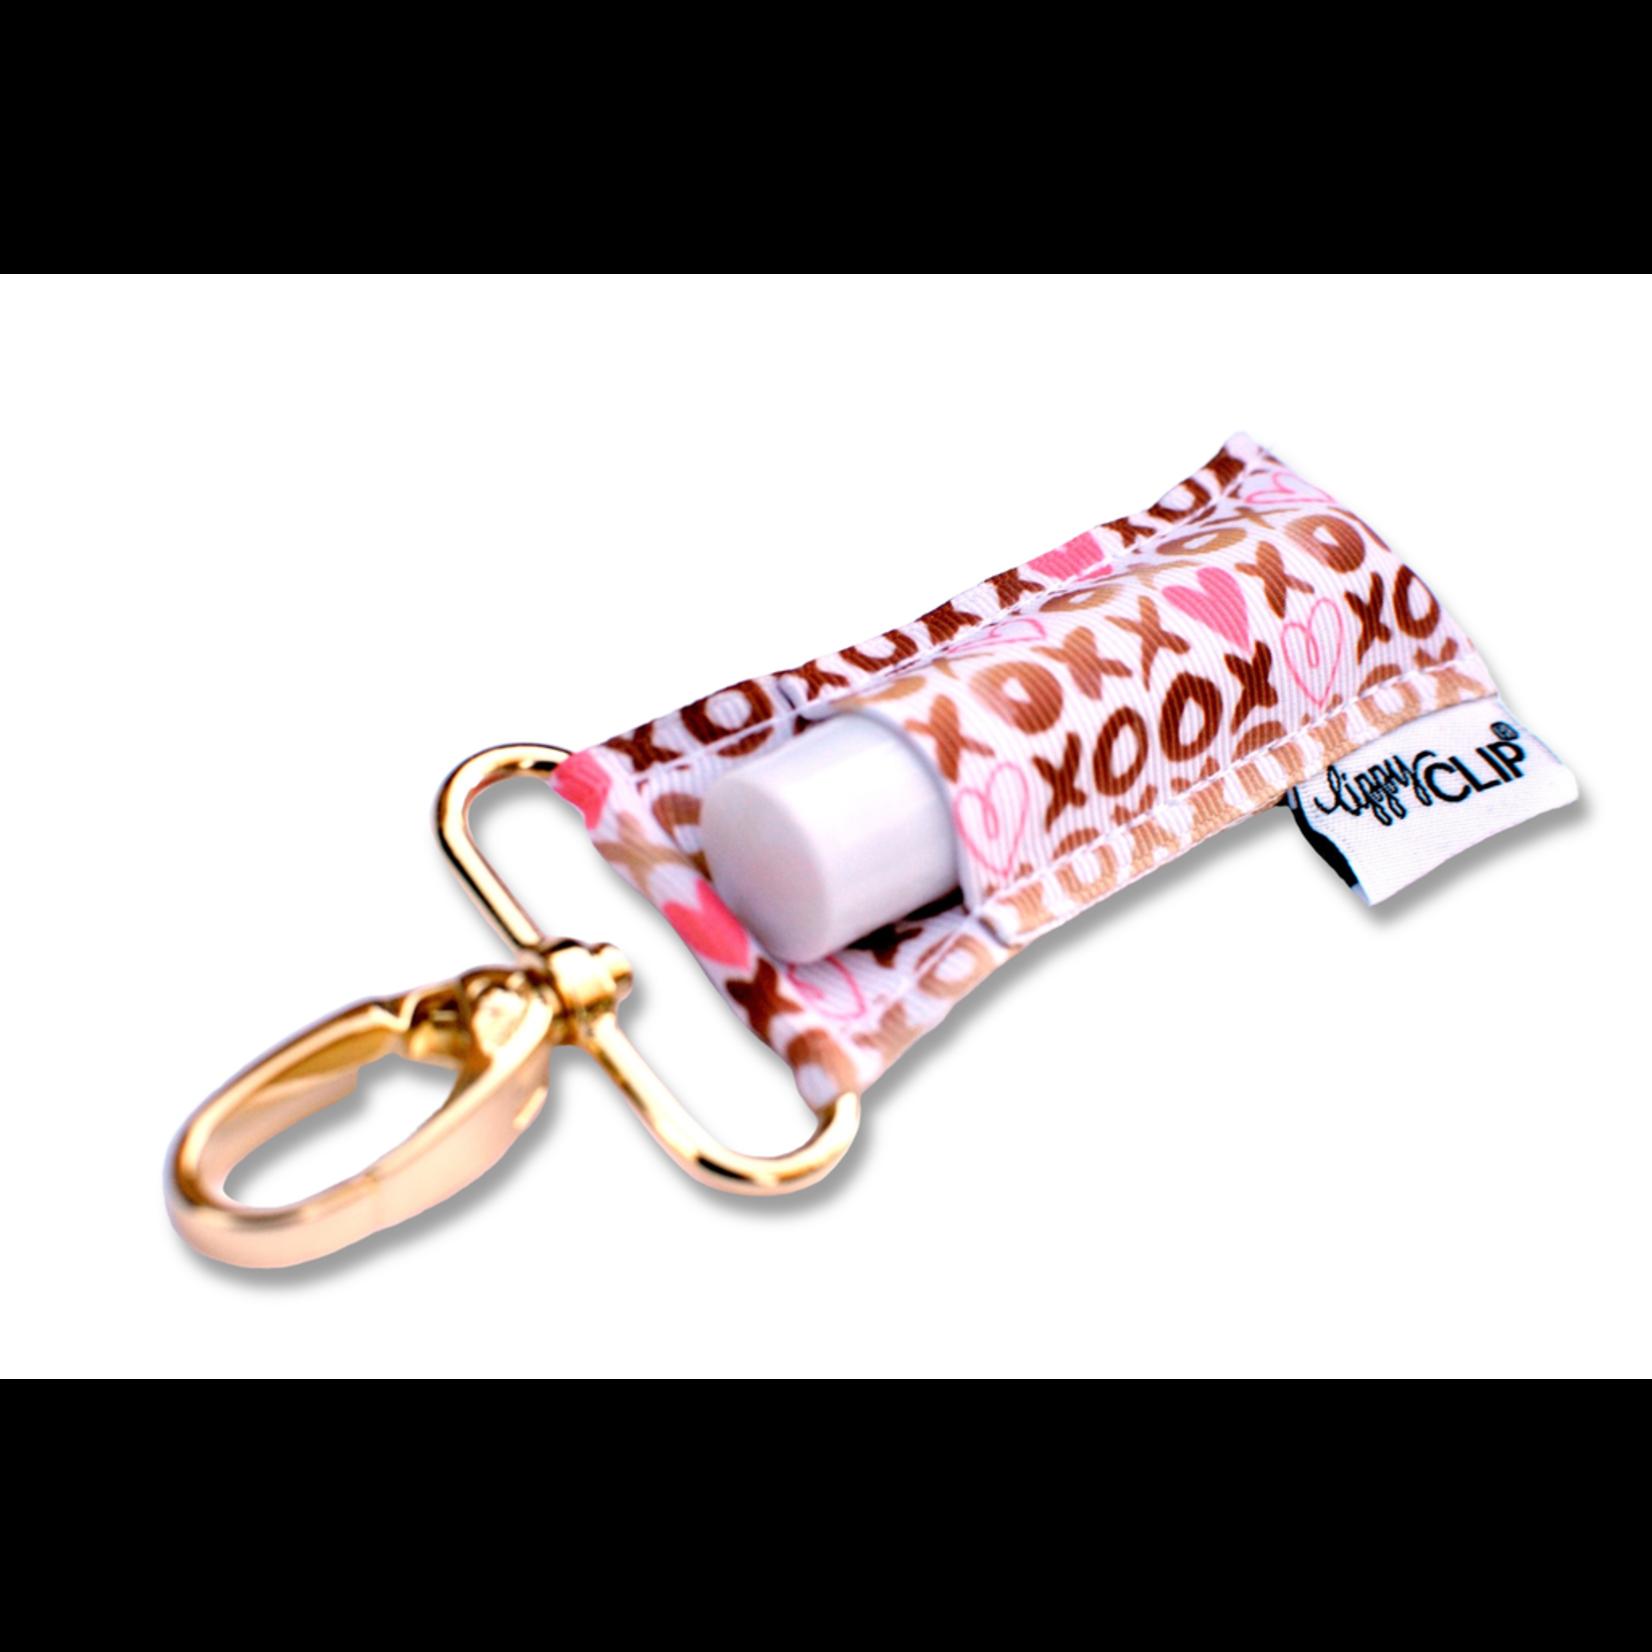 LippyClip Gold XOXO lip balm holder